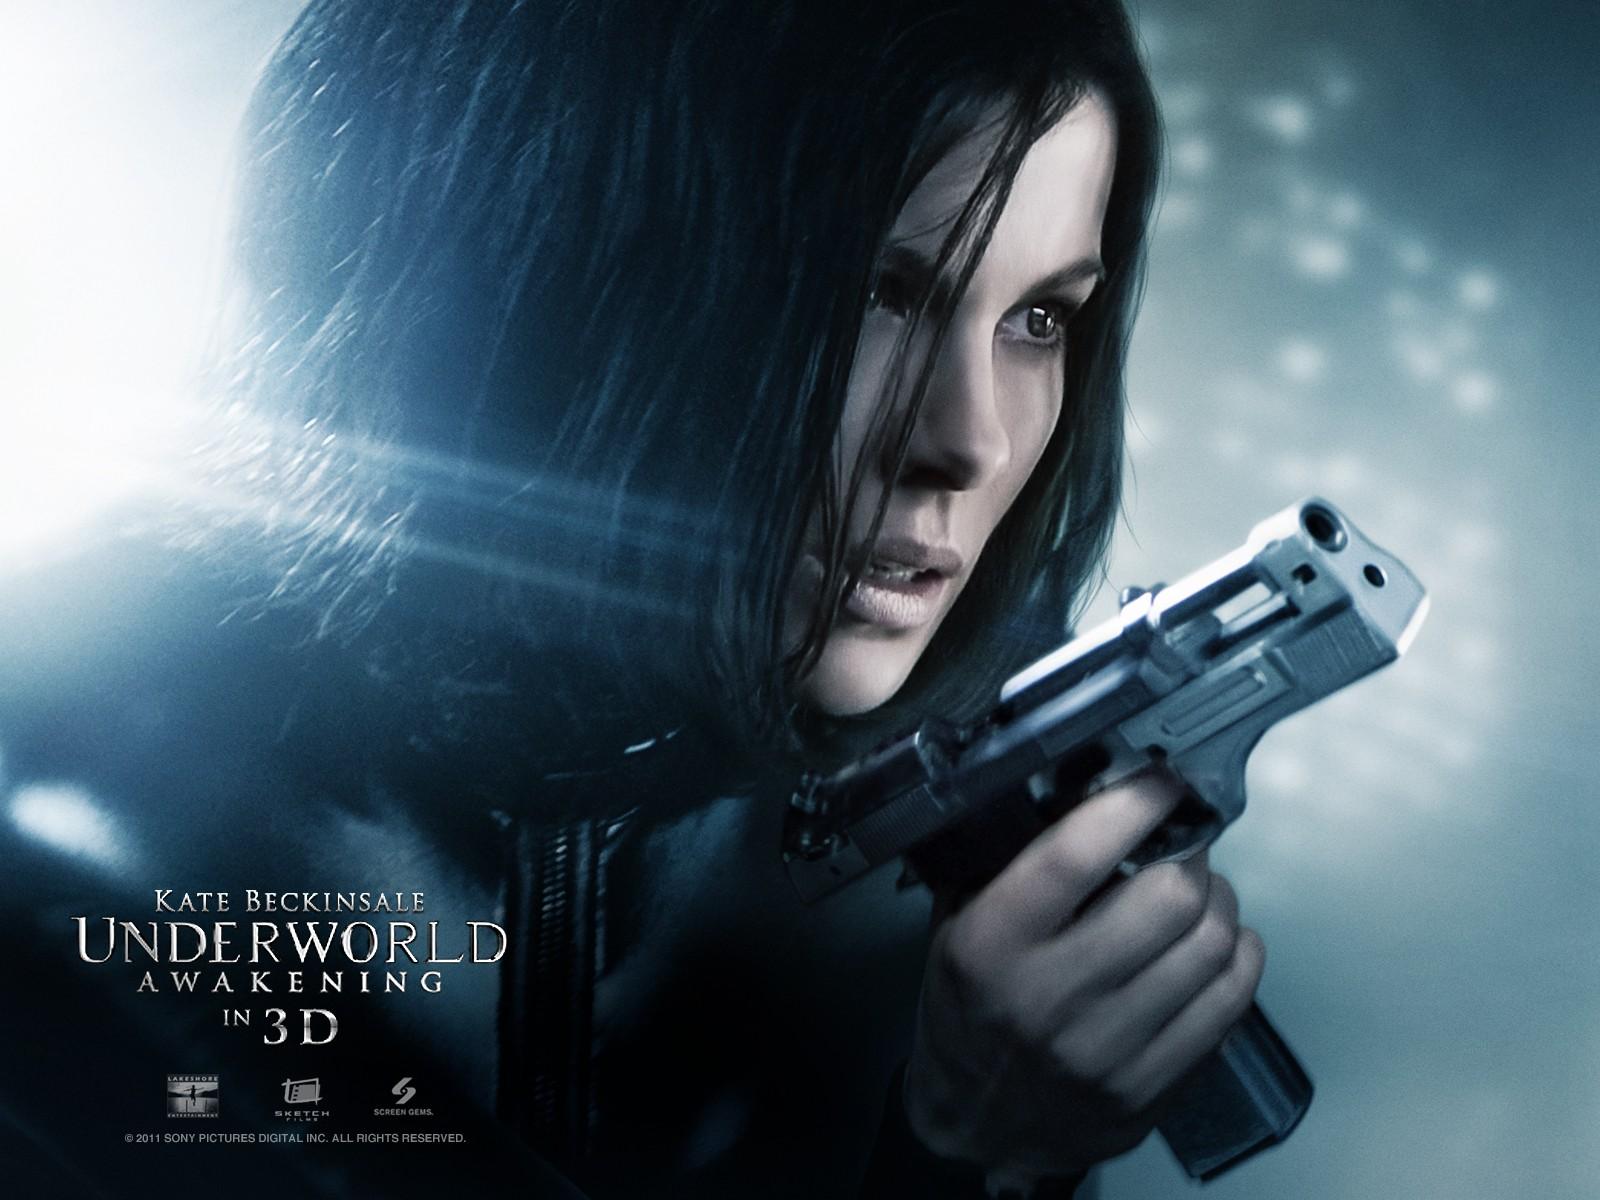 Underworld Awakening (2012) - Kate Beckinsale Wallpaper ...